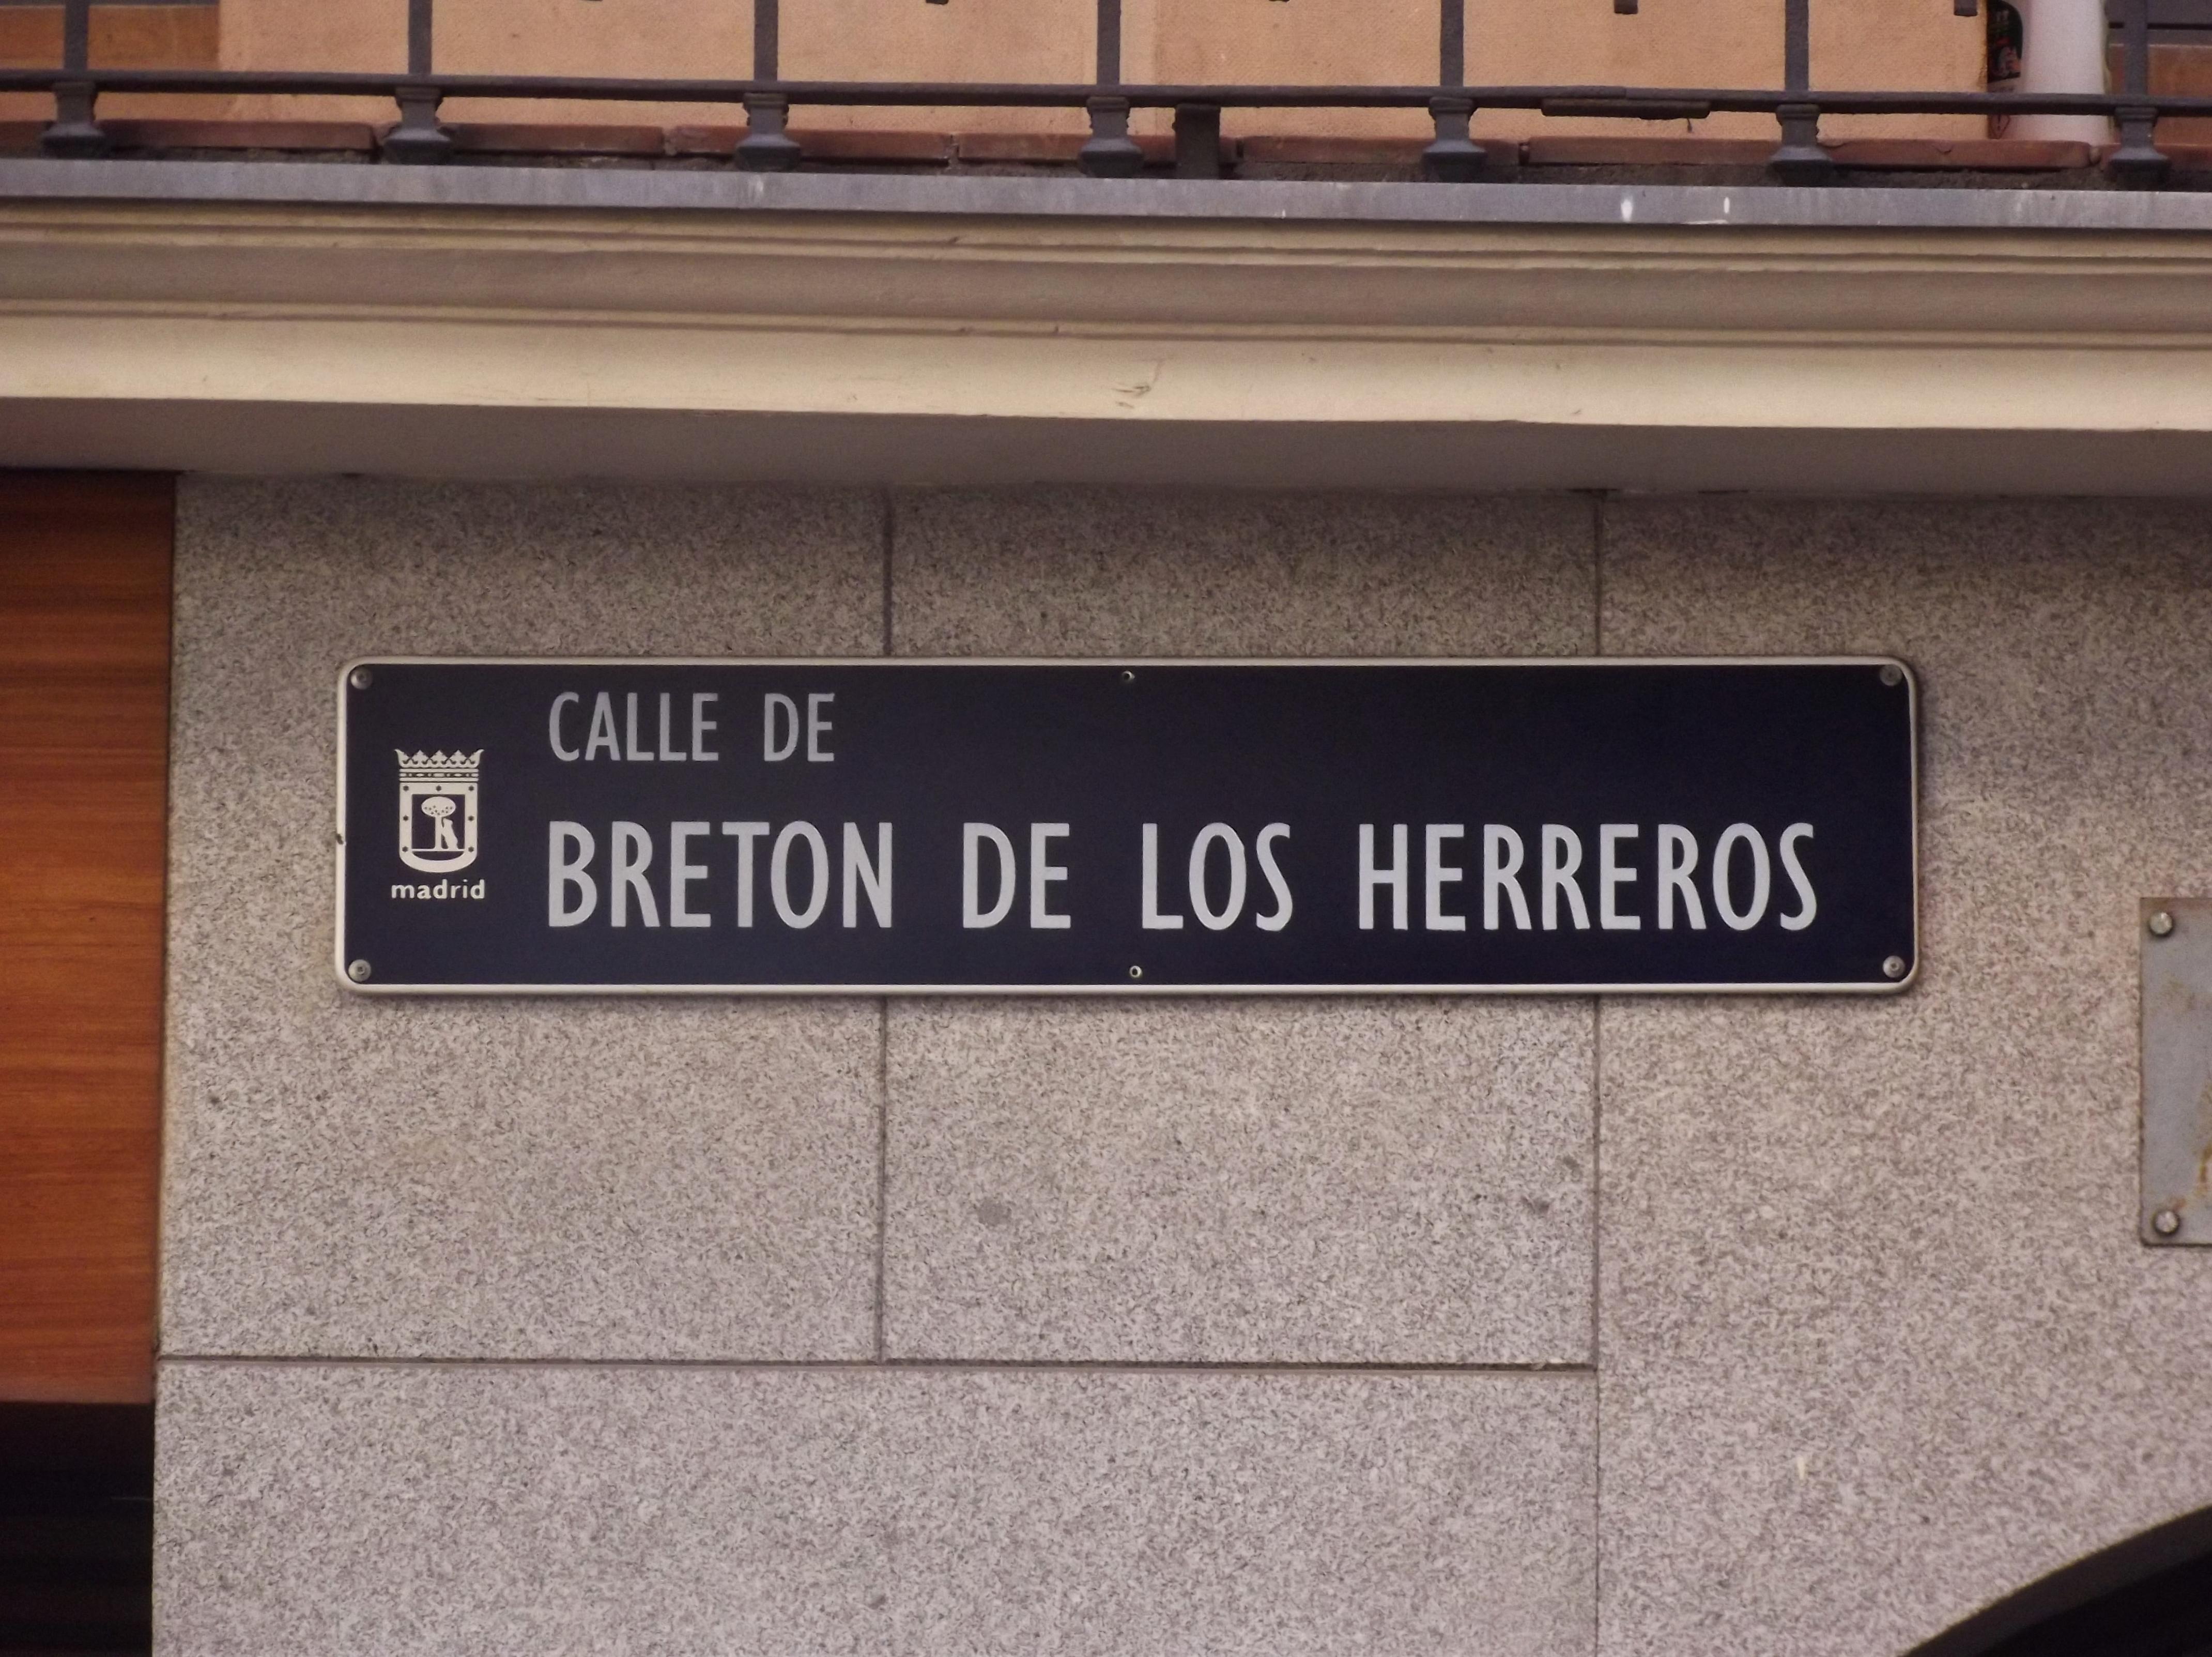 100 Fantastique Idées Breton De Los Herreros Madrid